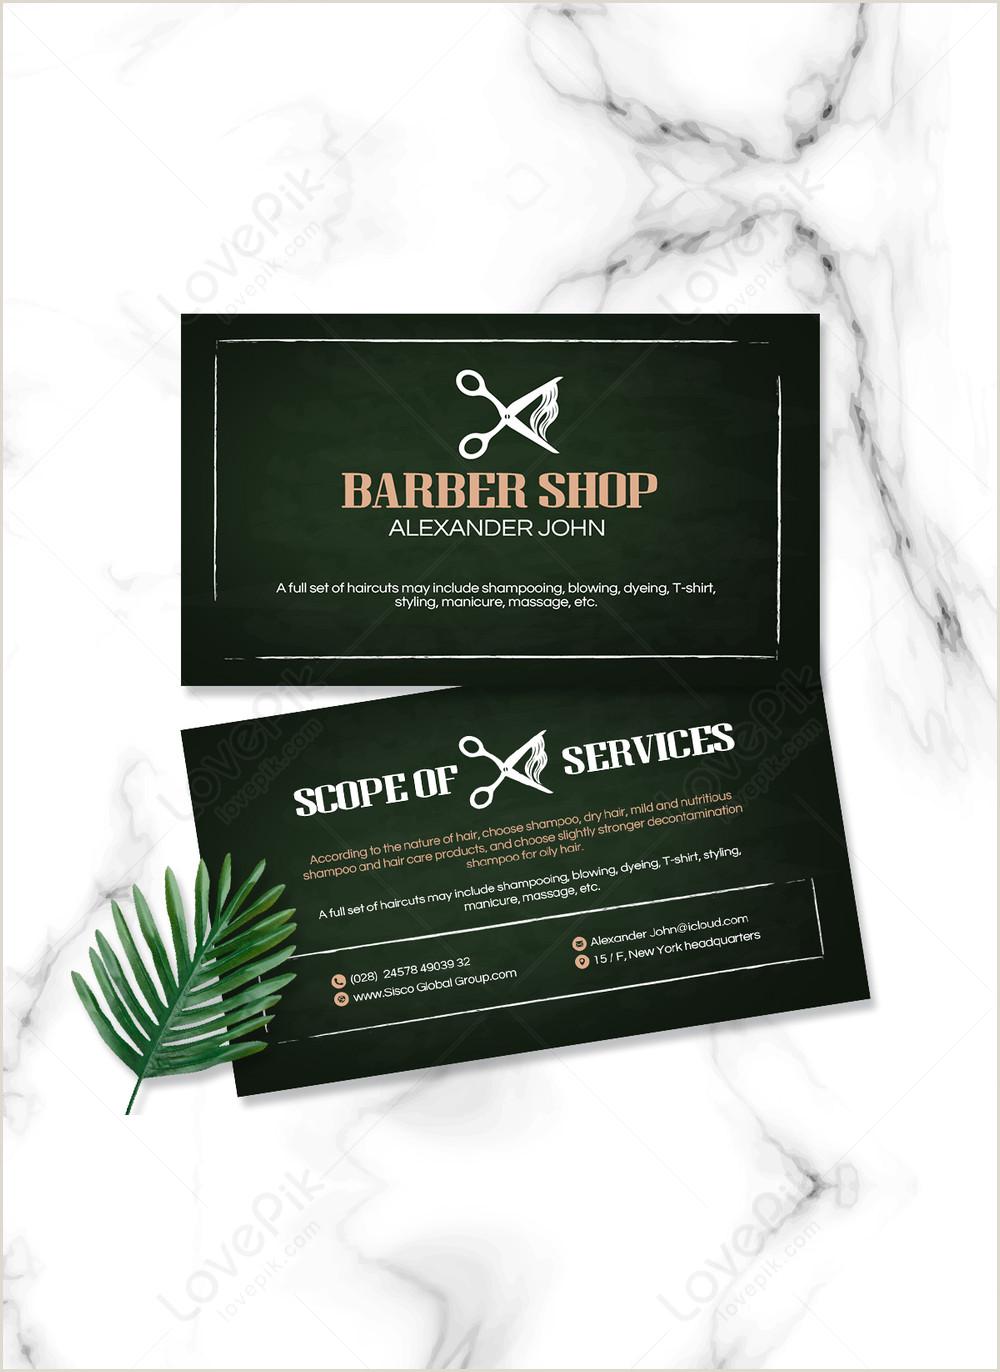 Unique Haircut Templates For Business Cards Haircut Hairline Line Creative Business Card Template